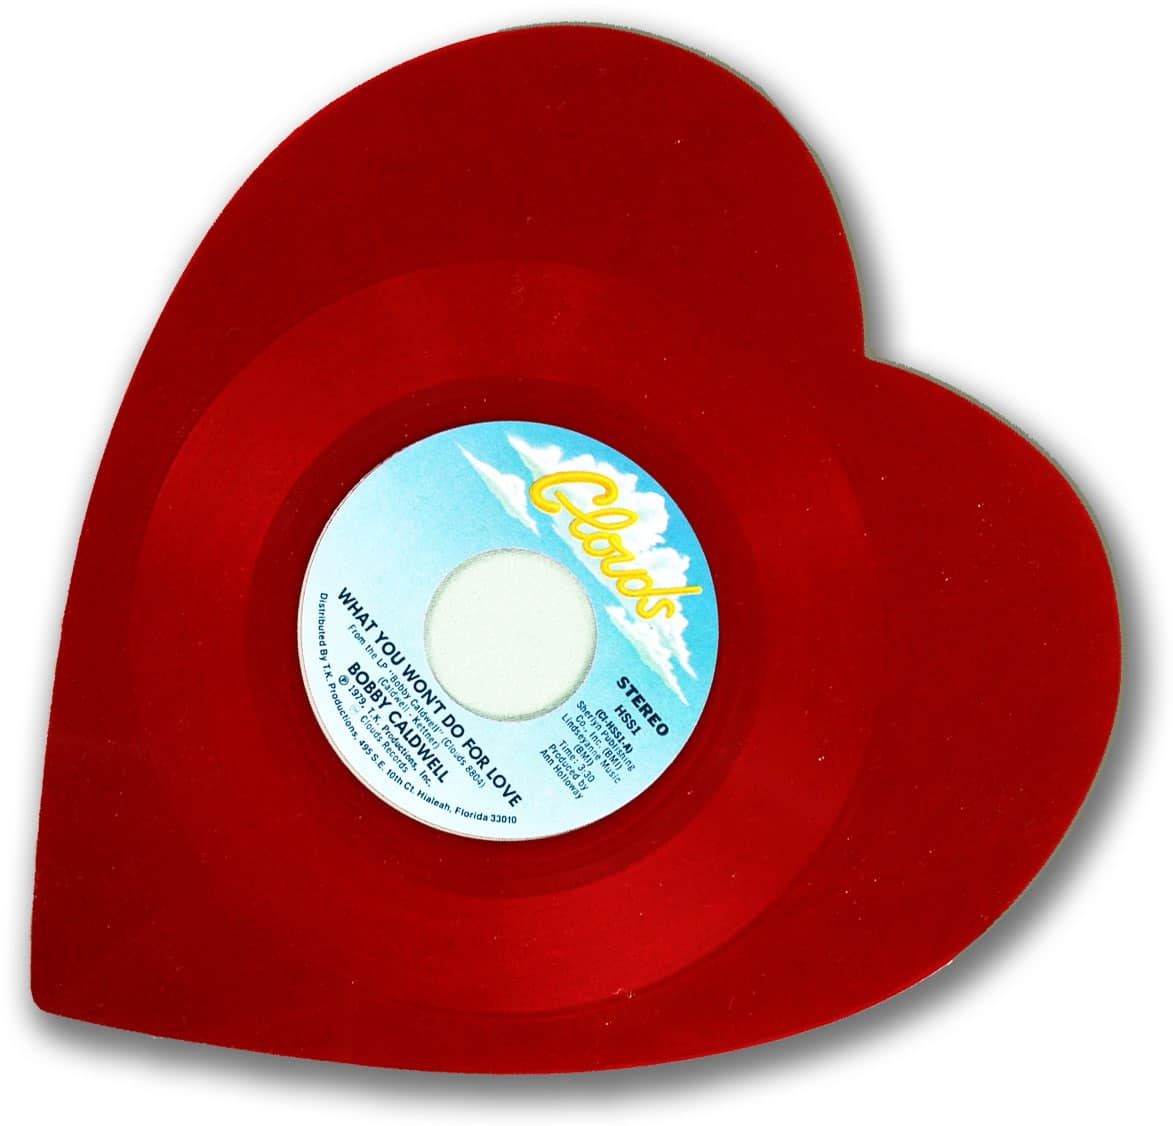 Bobby Caldwell, Heart Shaped Record